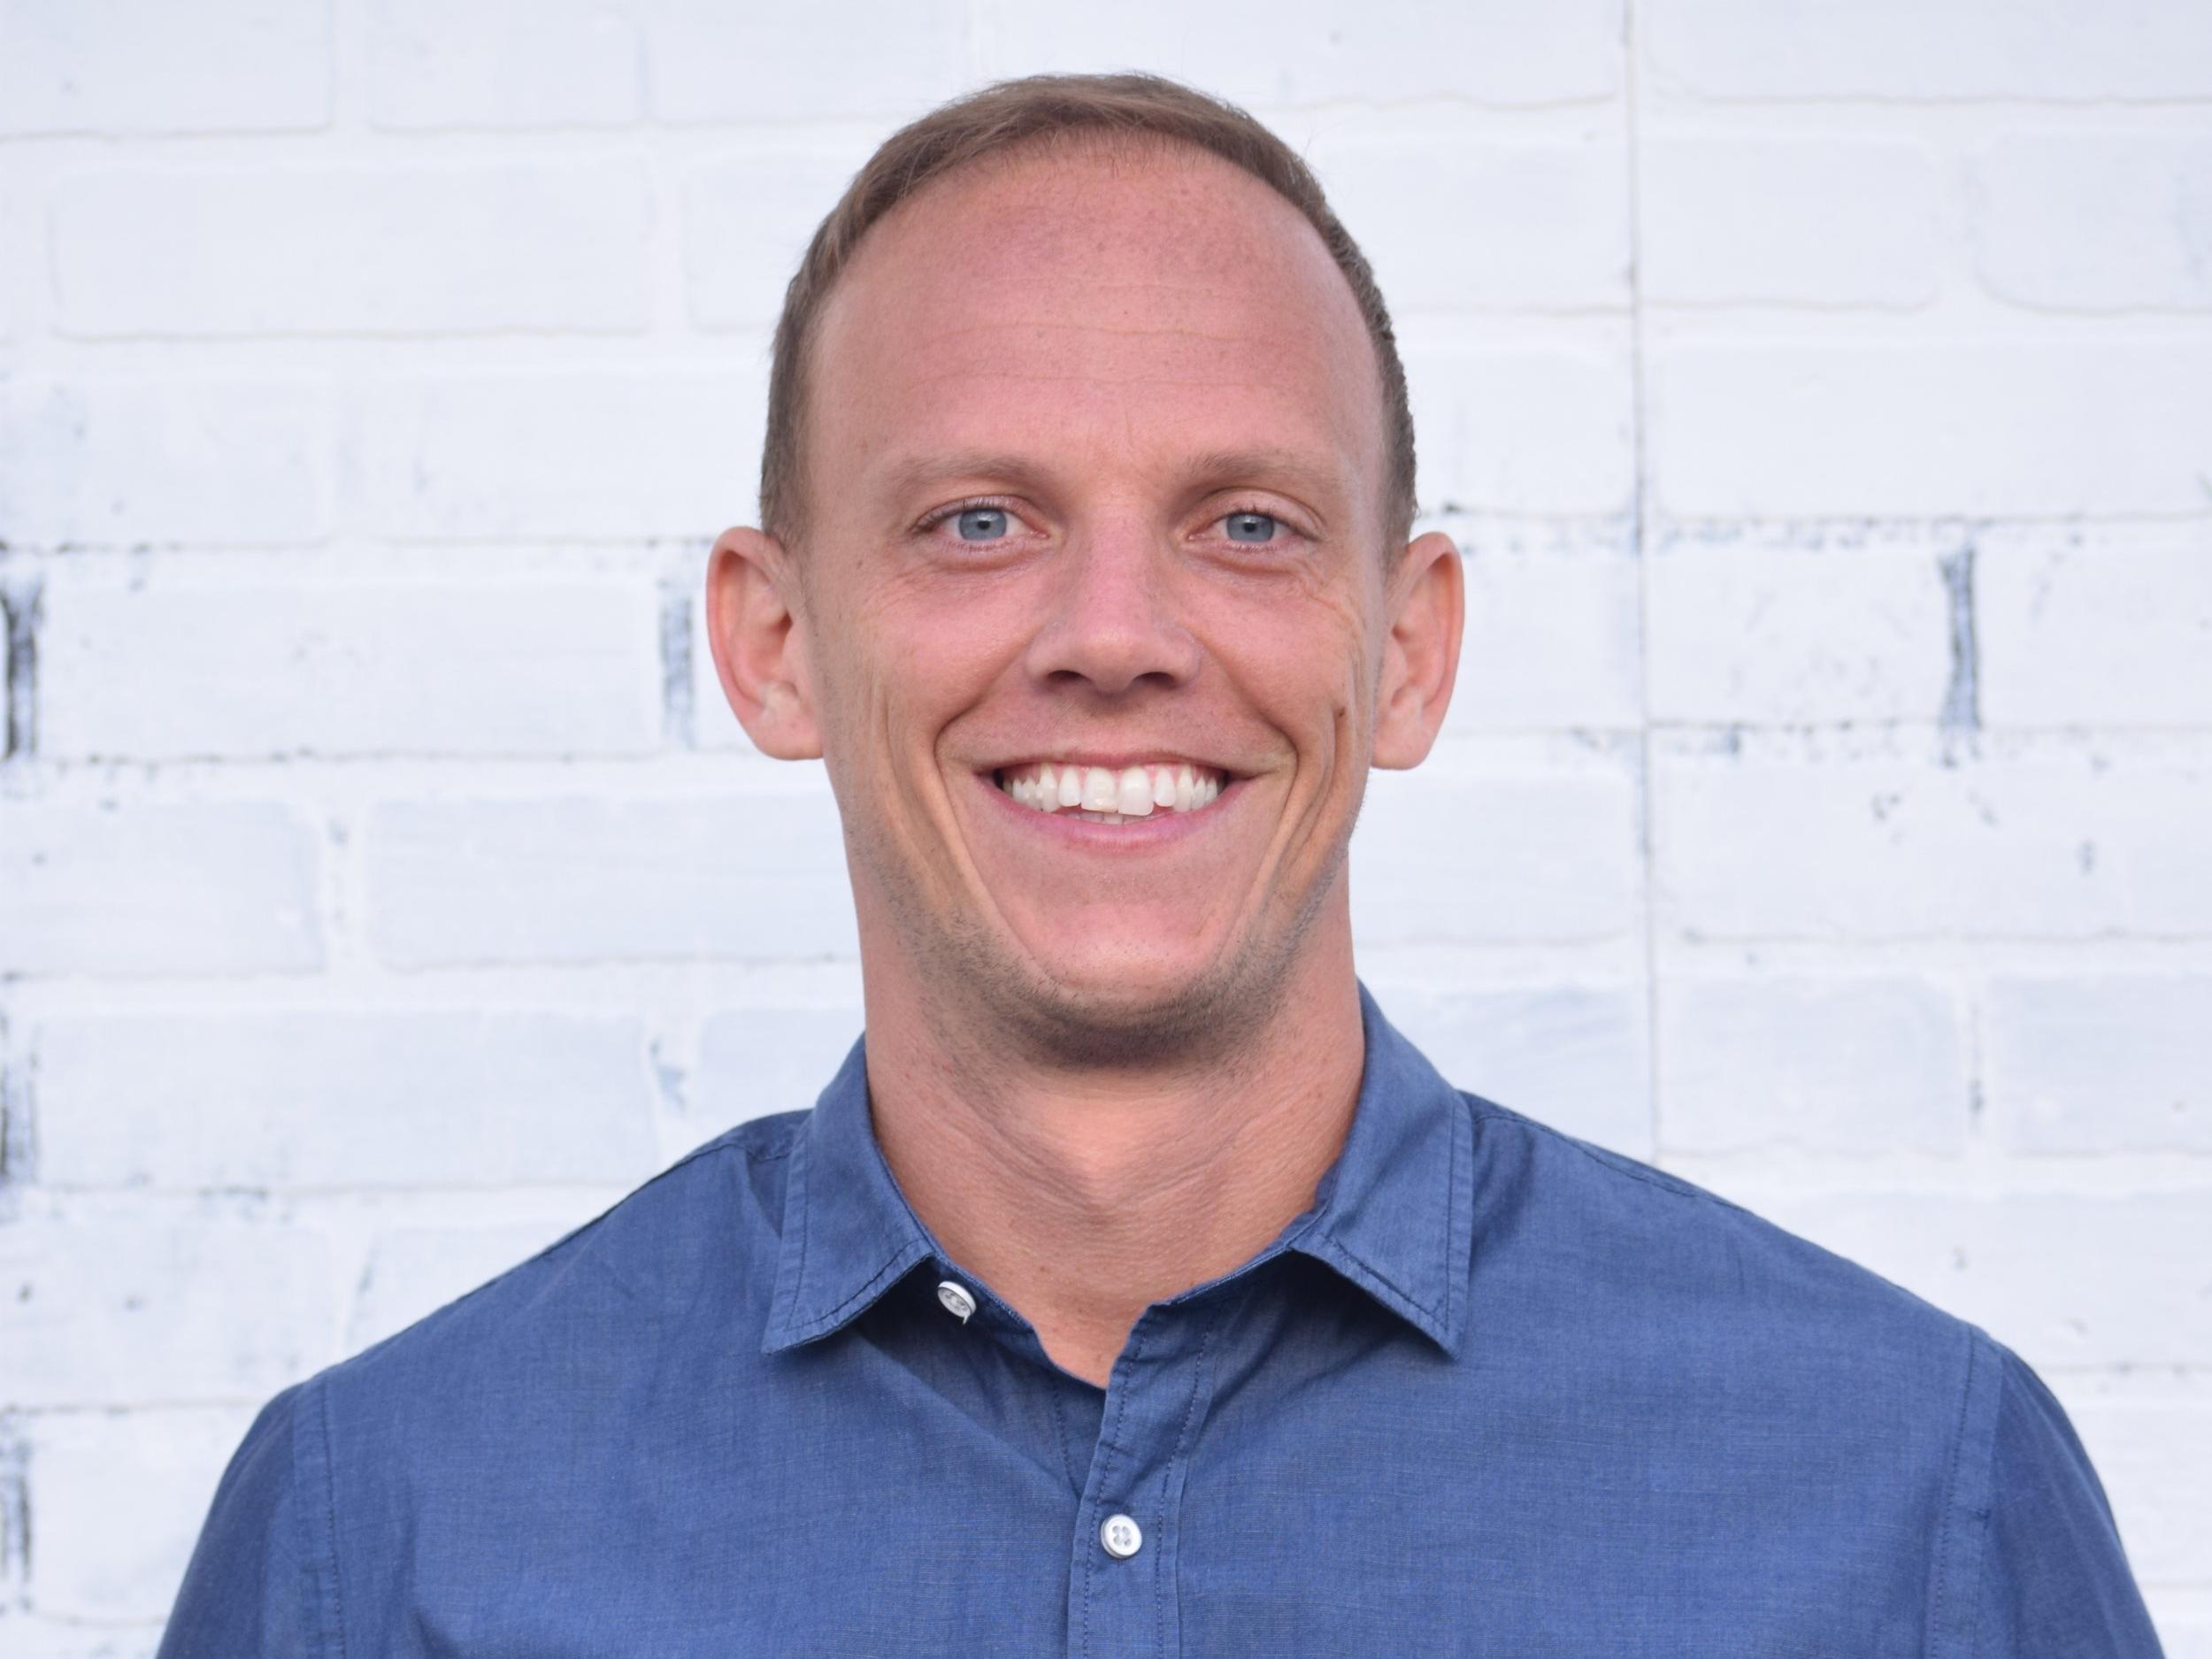 Aaron Burke - Lead Pastor at Radiant Church in Tampa, FL